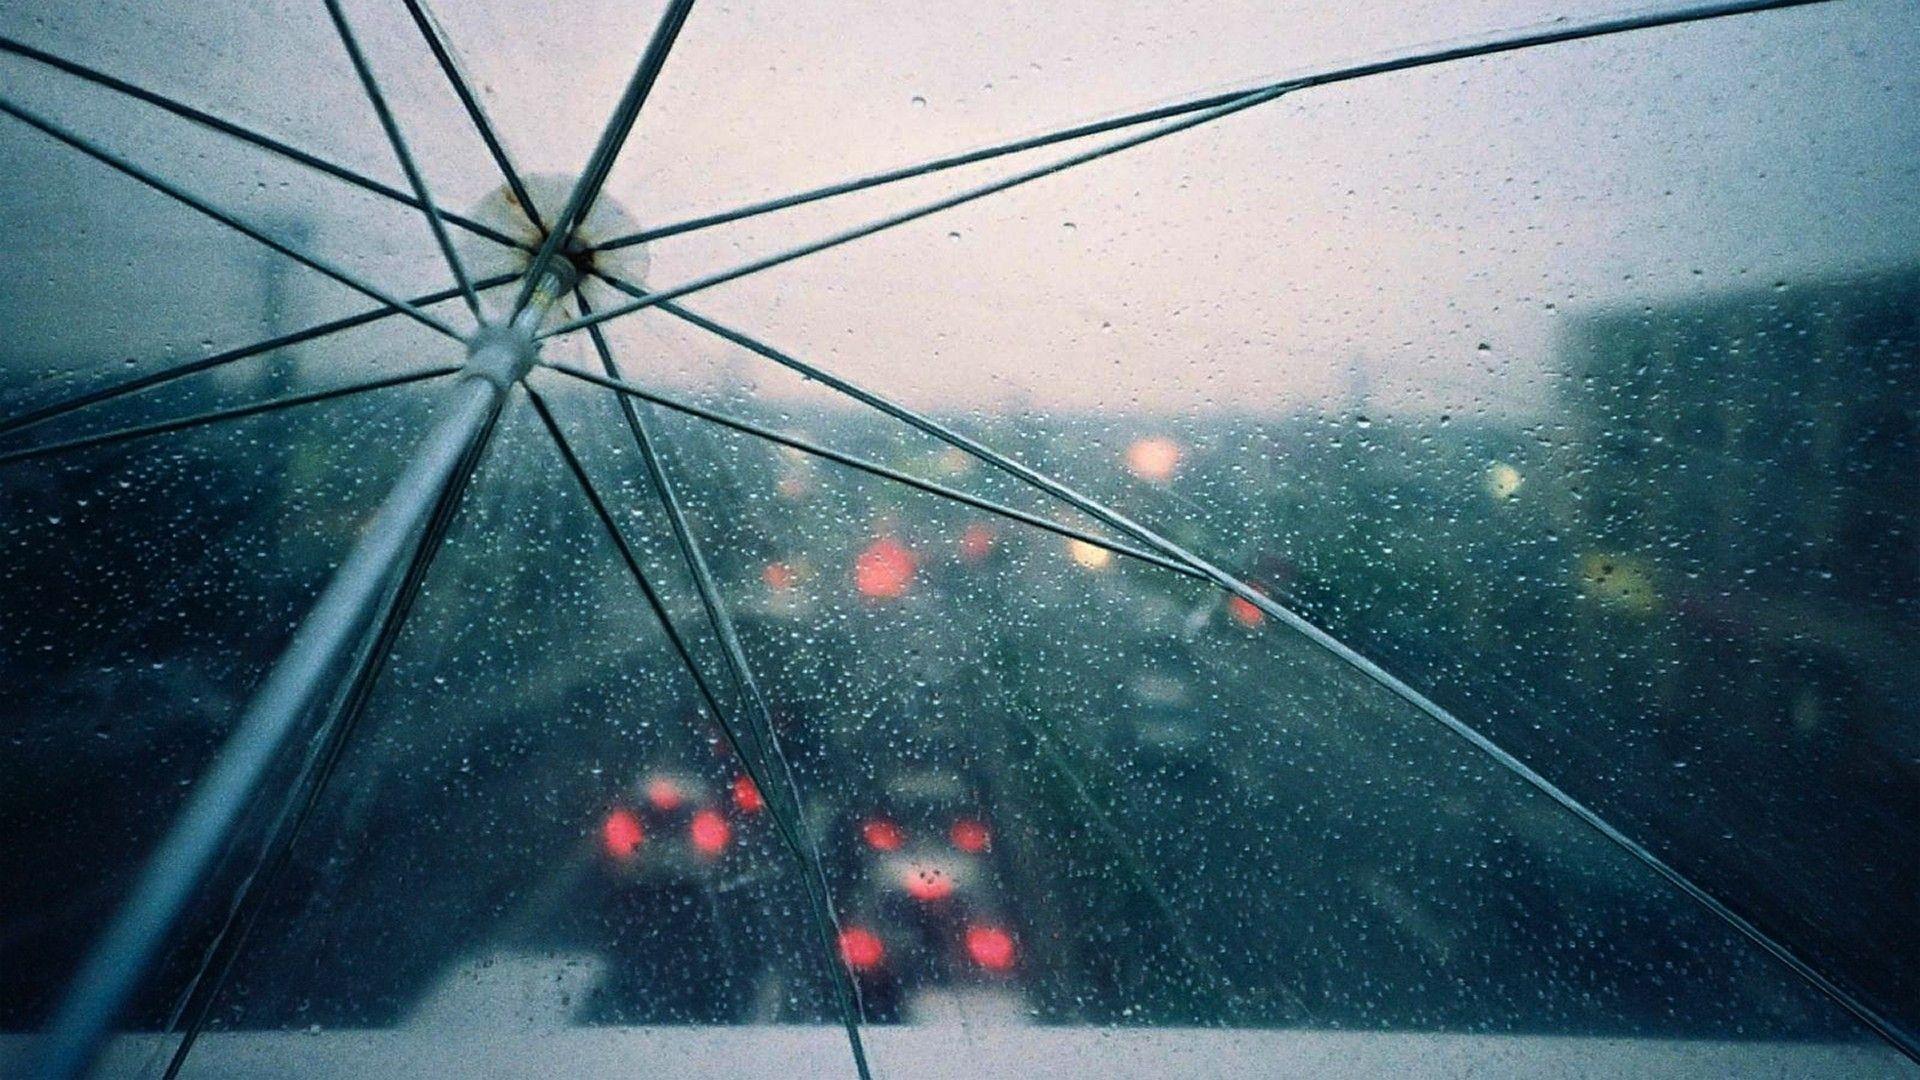 Rain Desktop Backgrounds Hd Wallpaper Cave